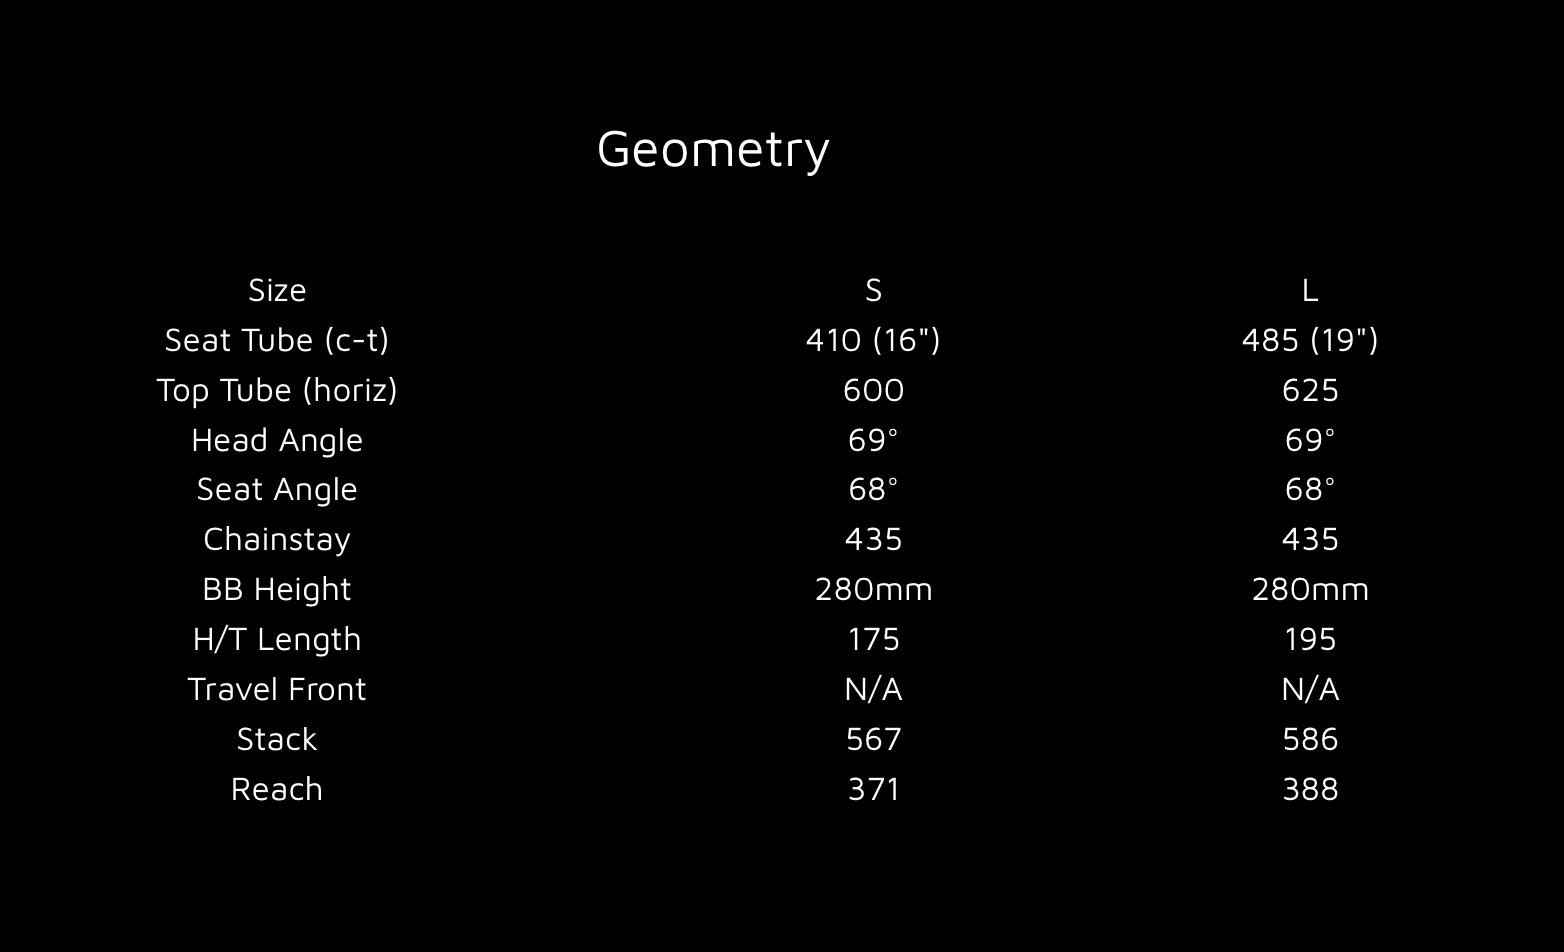 2017 Pax Geometry .png